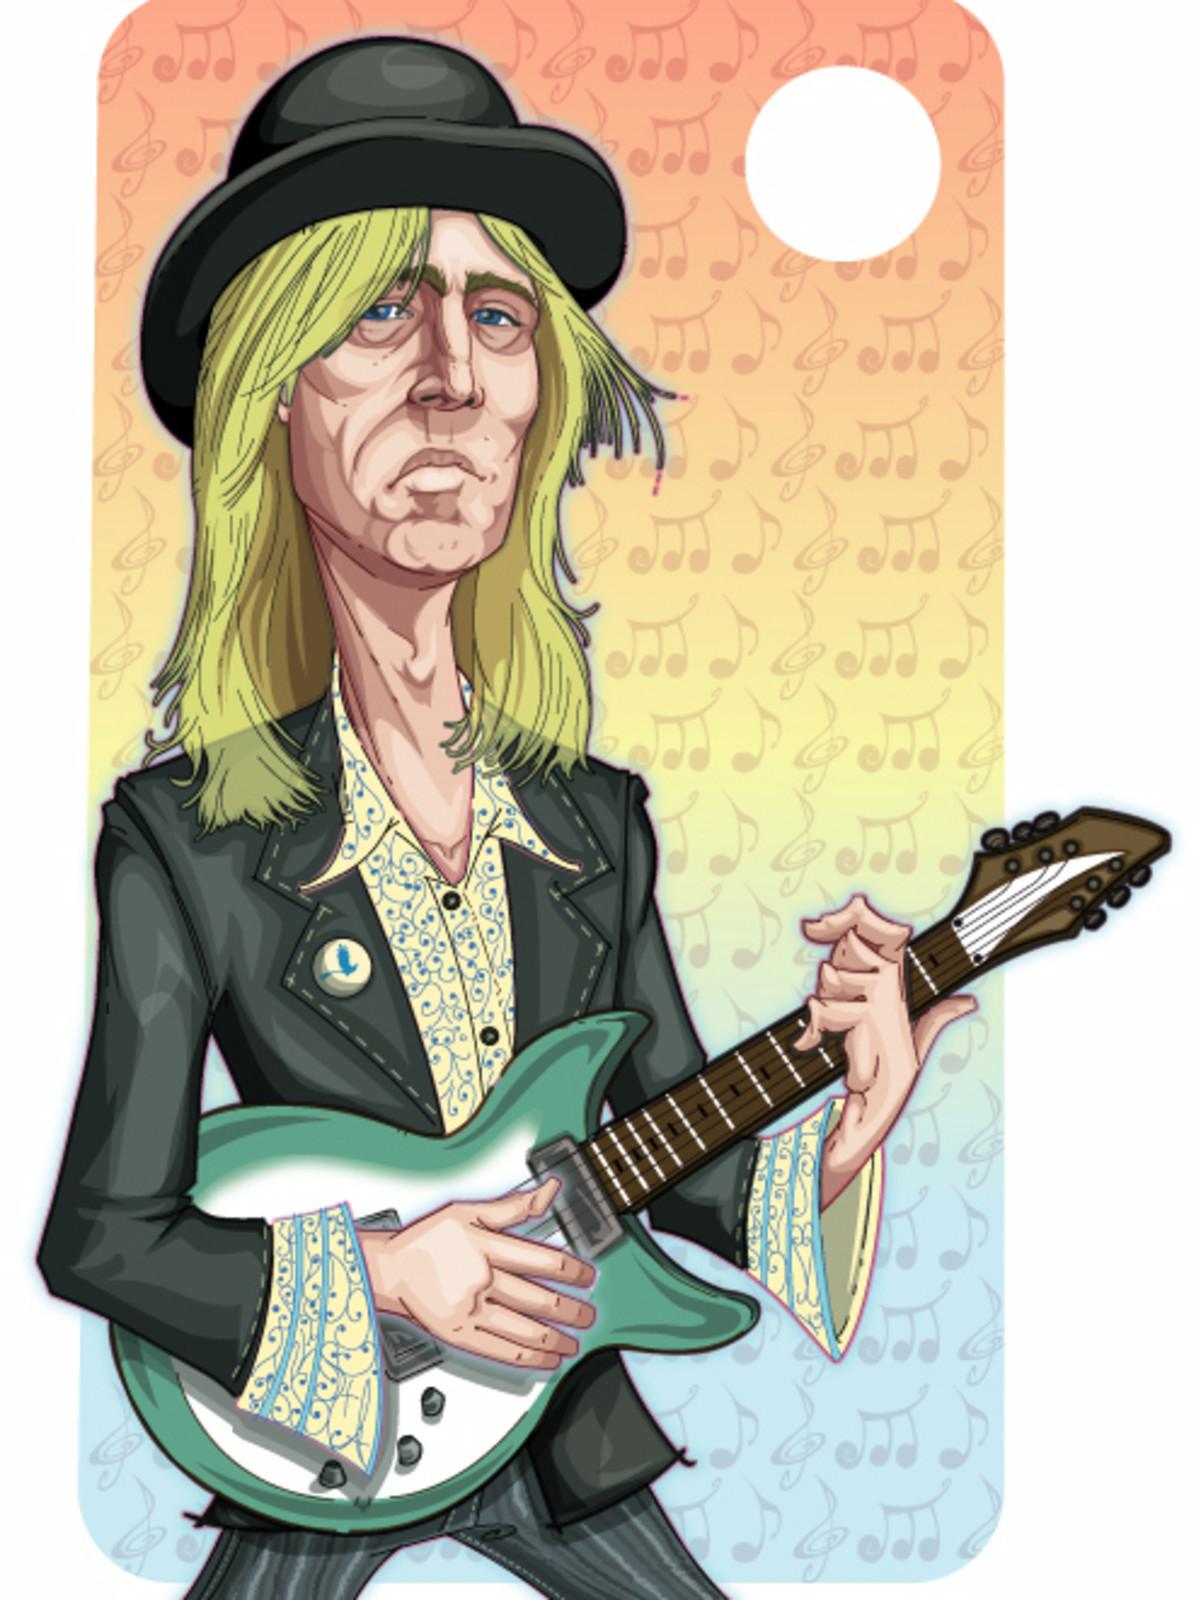 Tom Petty cartoon